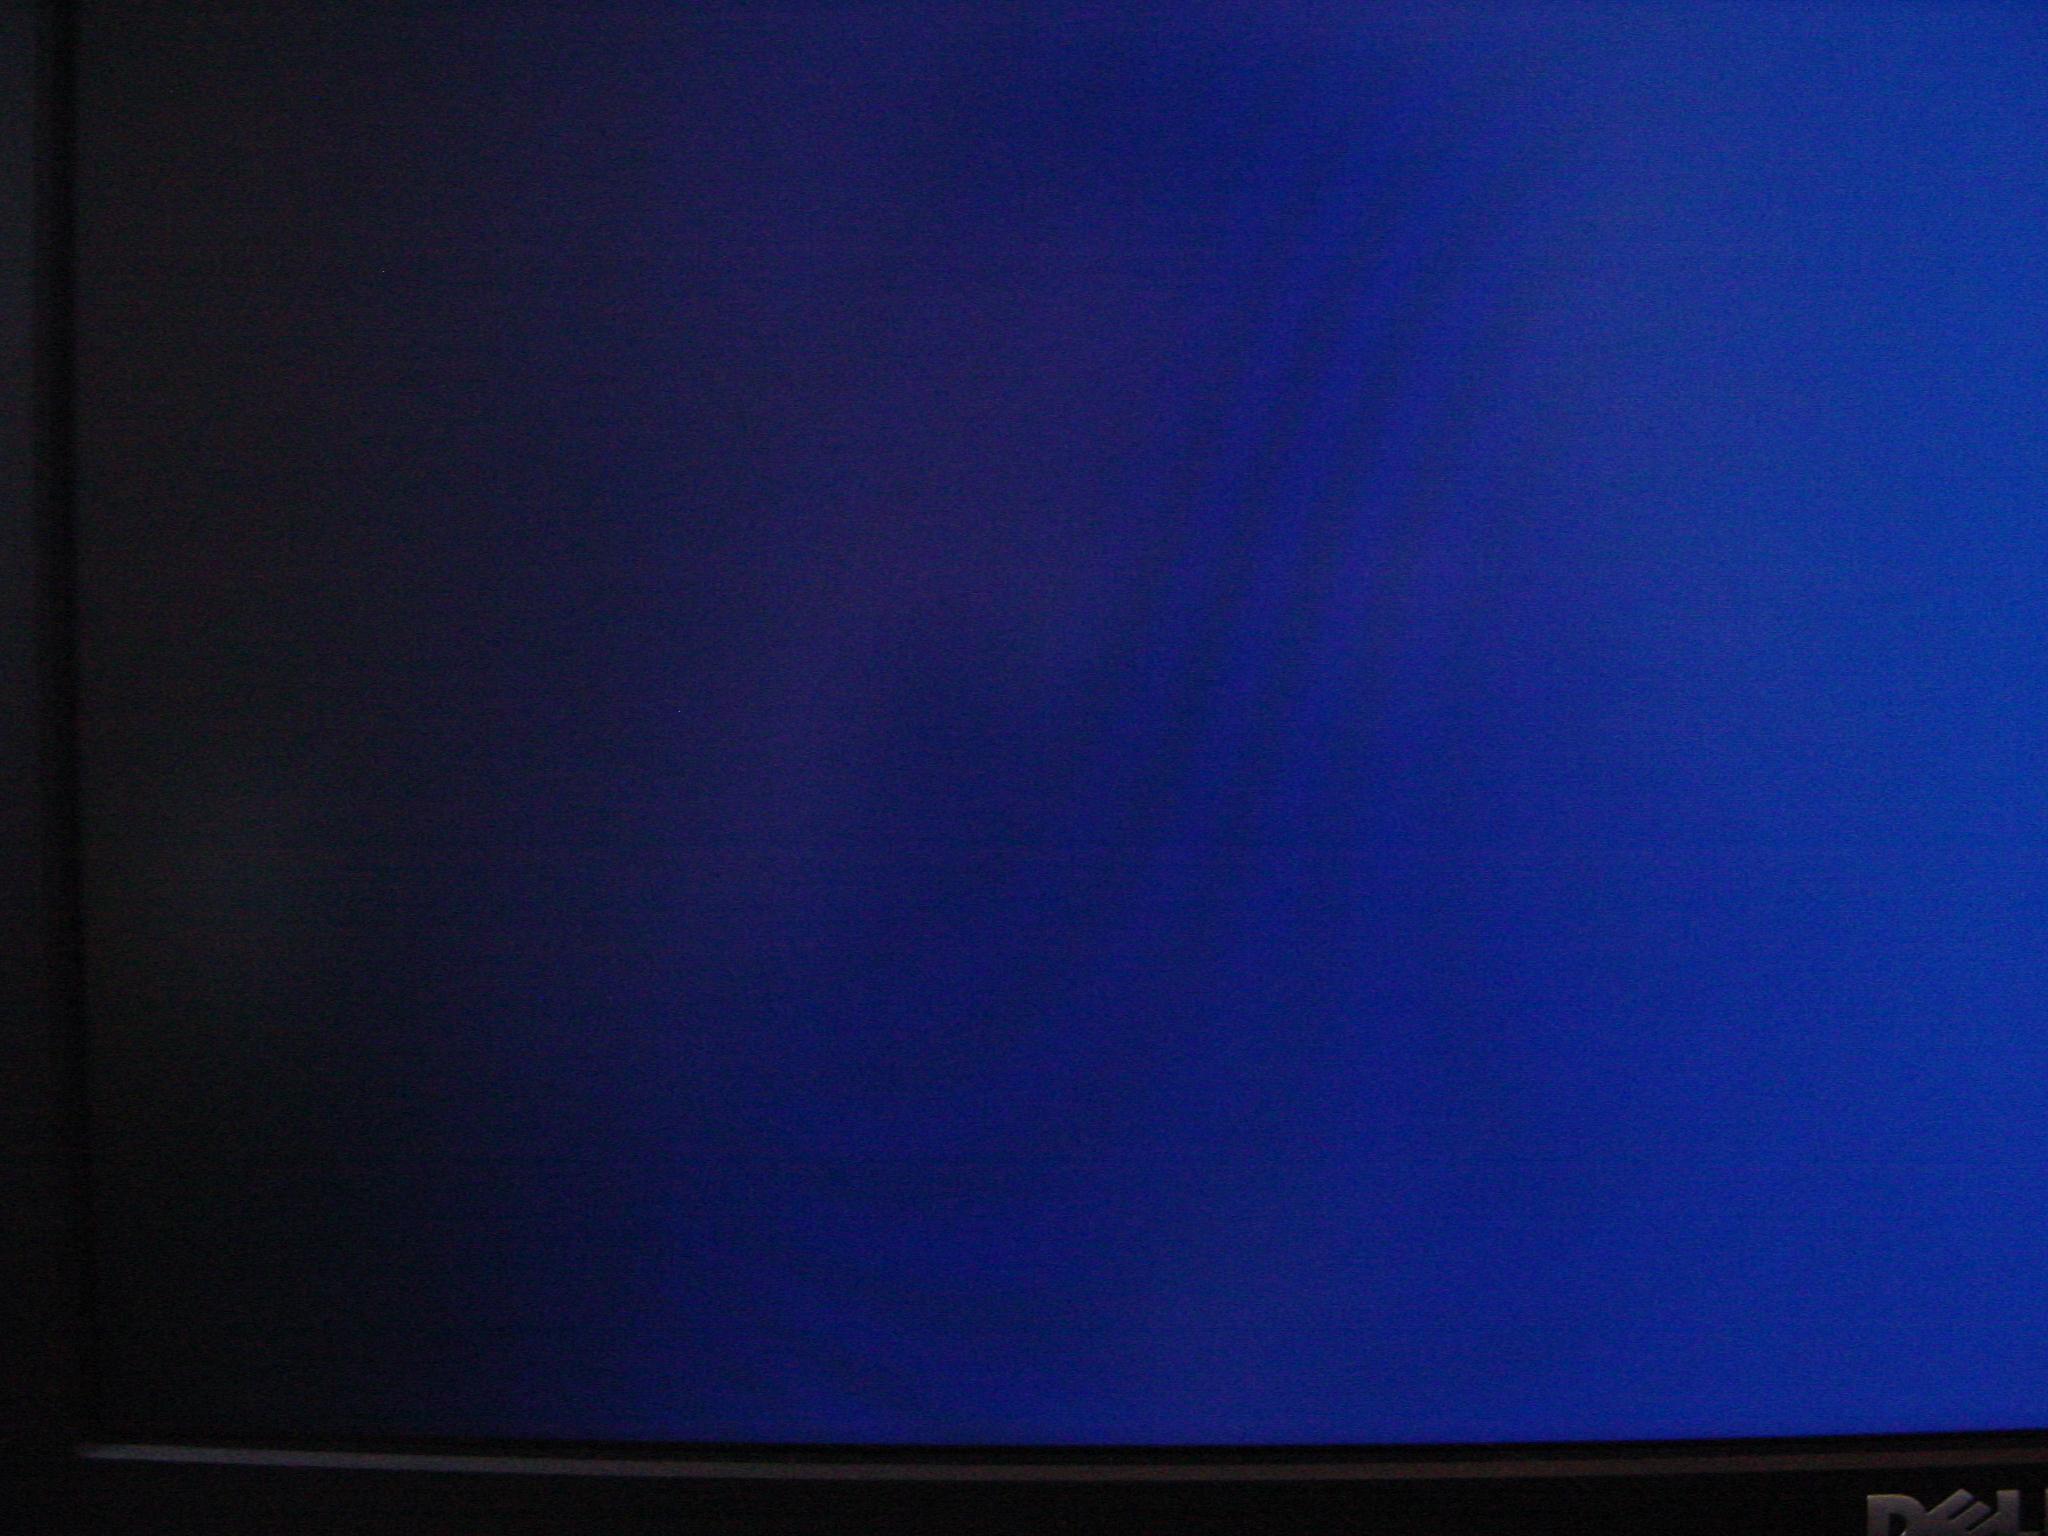 تحميل برنامج NVIDIA Forceware for 9X-ME, رابط مباشر thumbnail